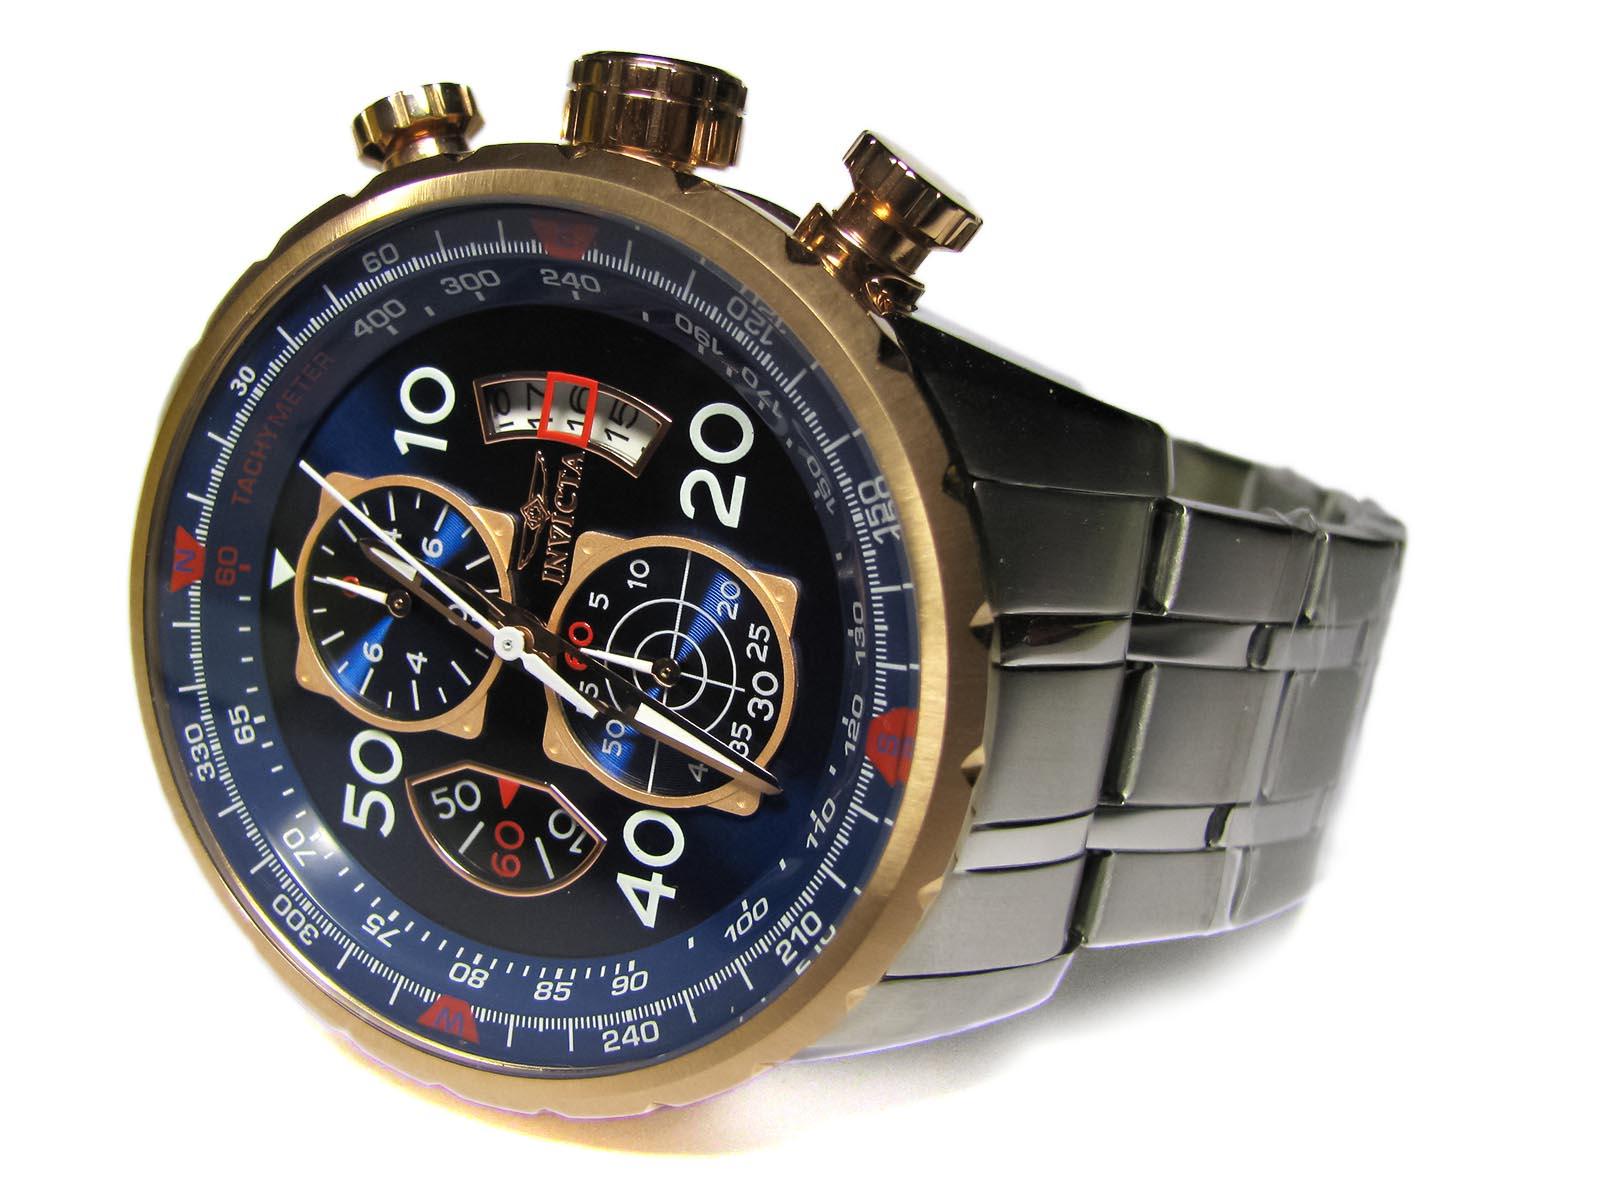 Invicta 17203 Aviator Watch ⋆ High Quality Watch Gallery